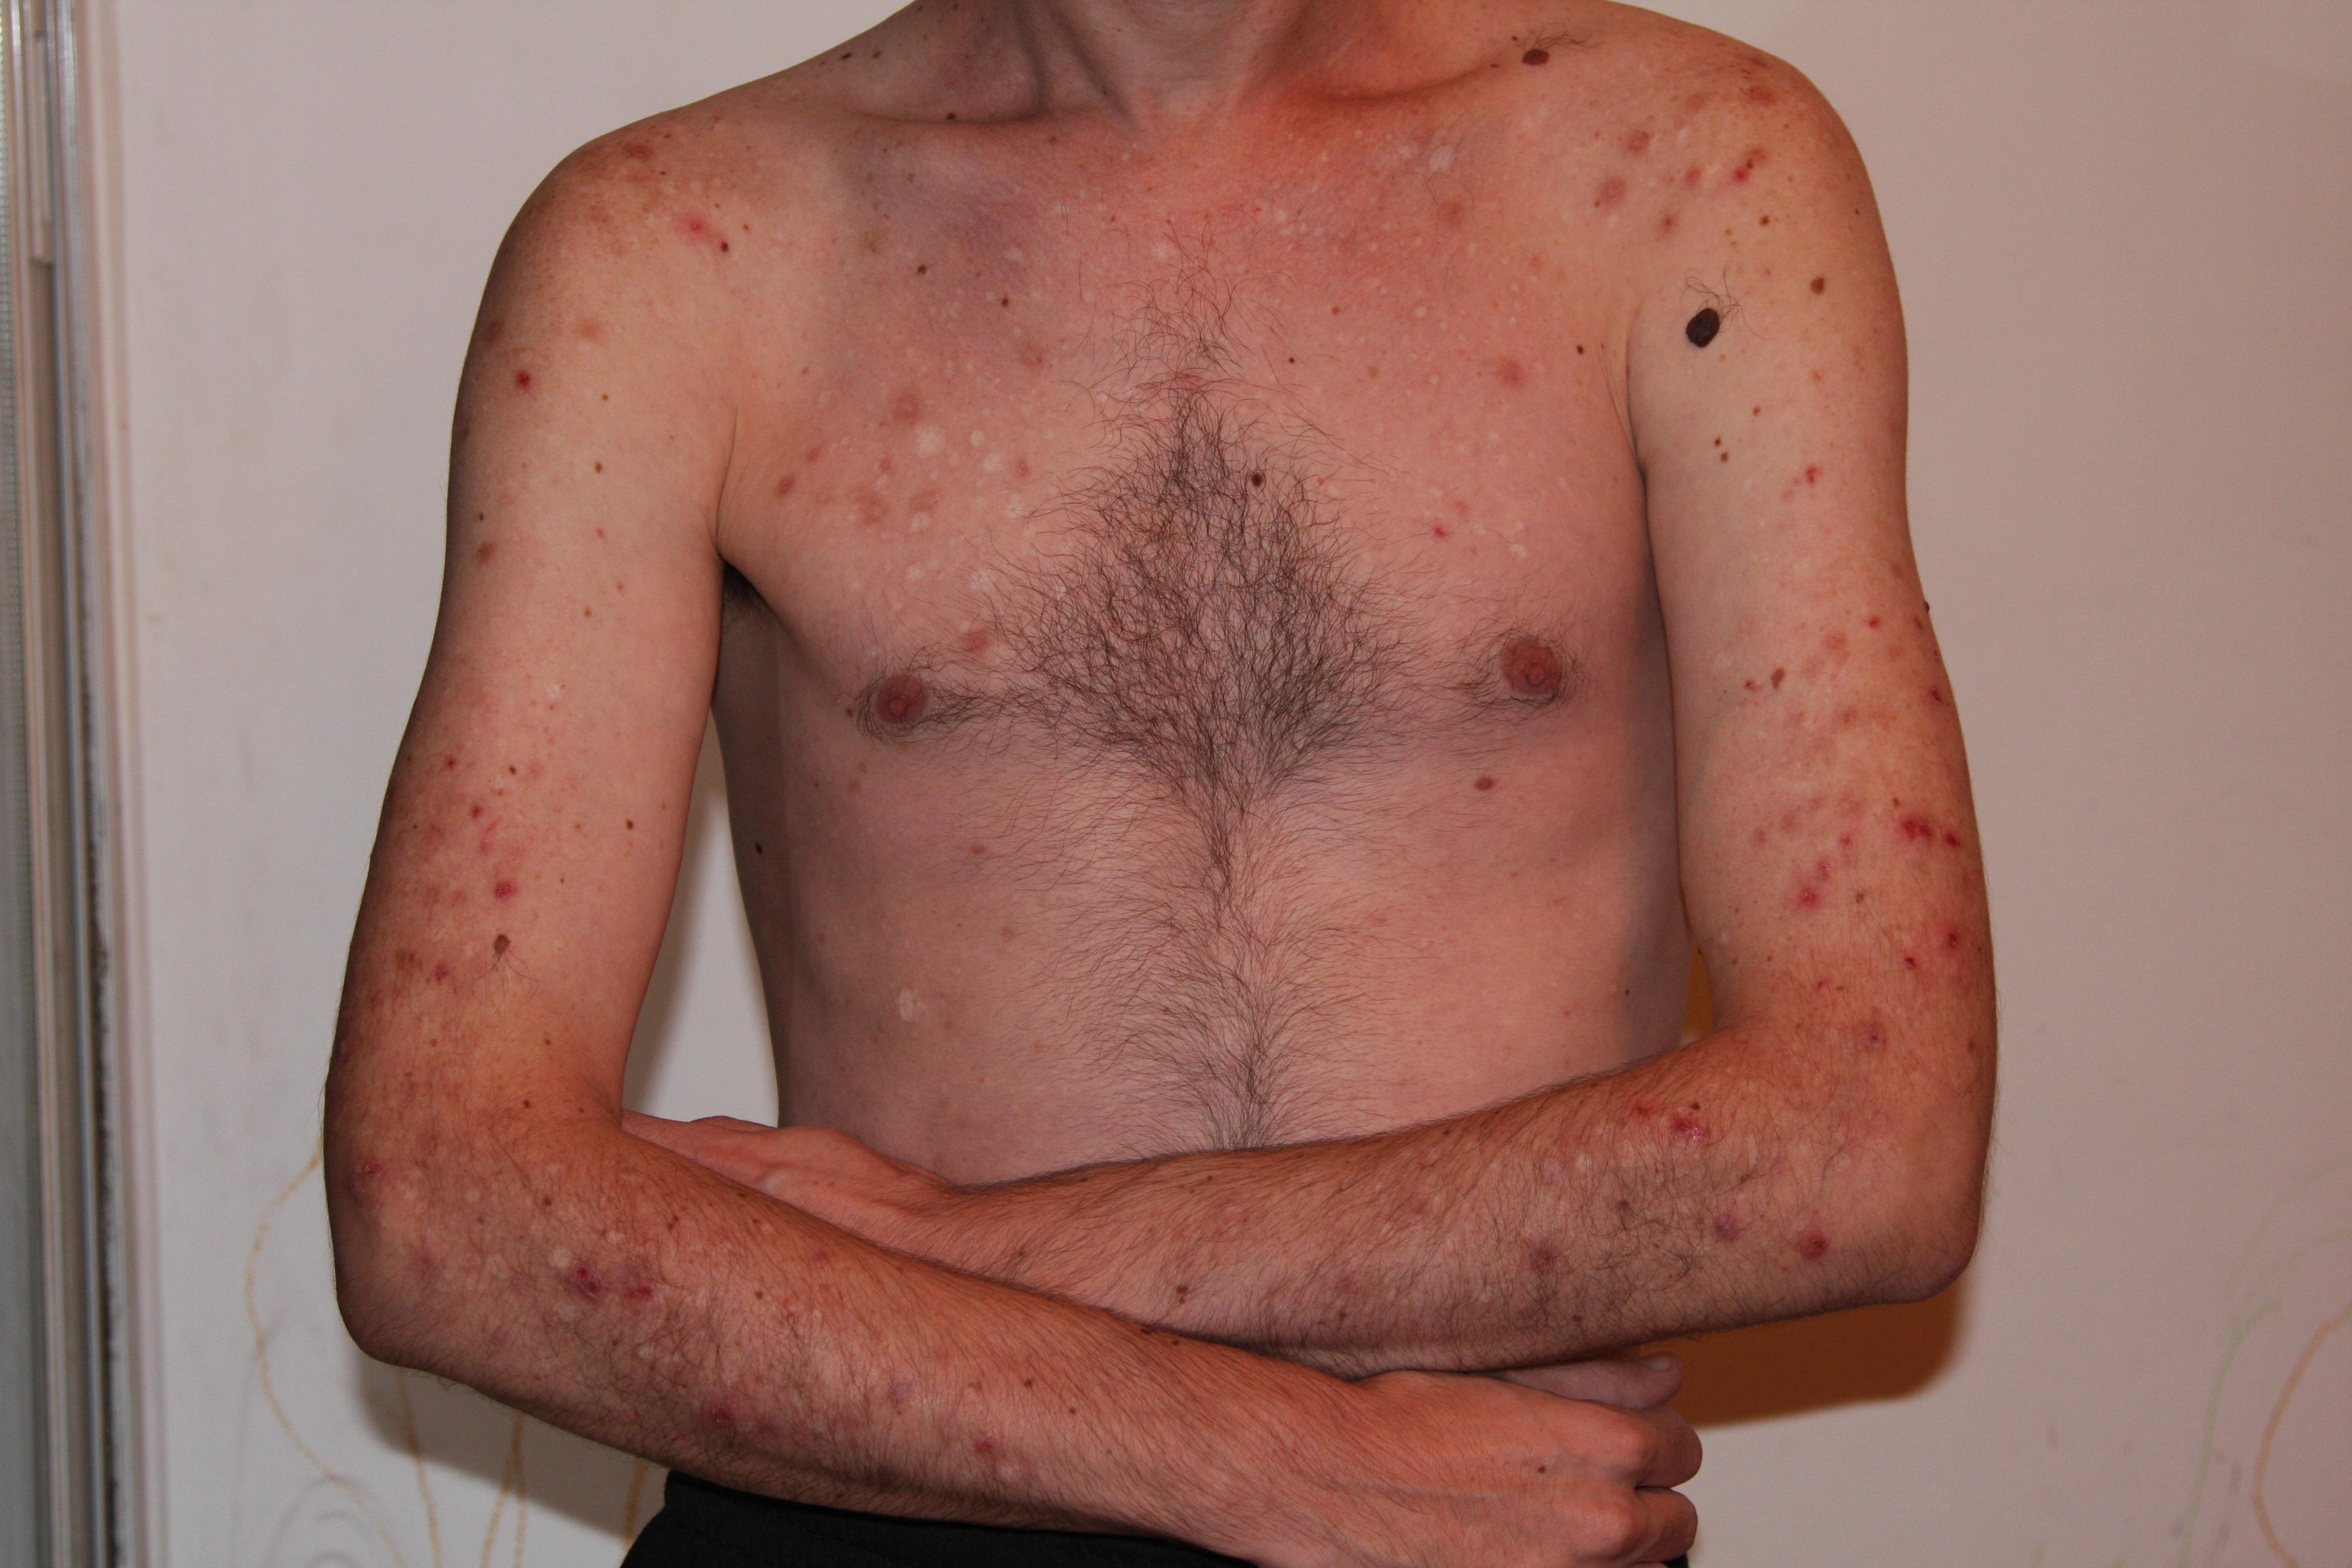 Excoriation Skin Picking Disorder